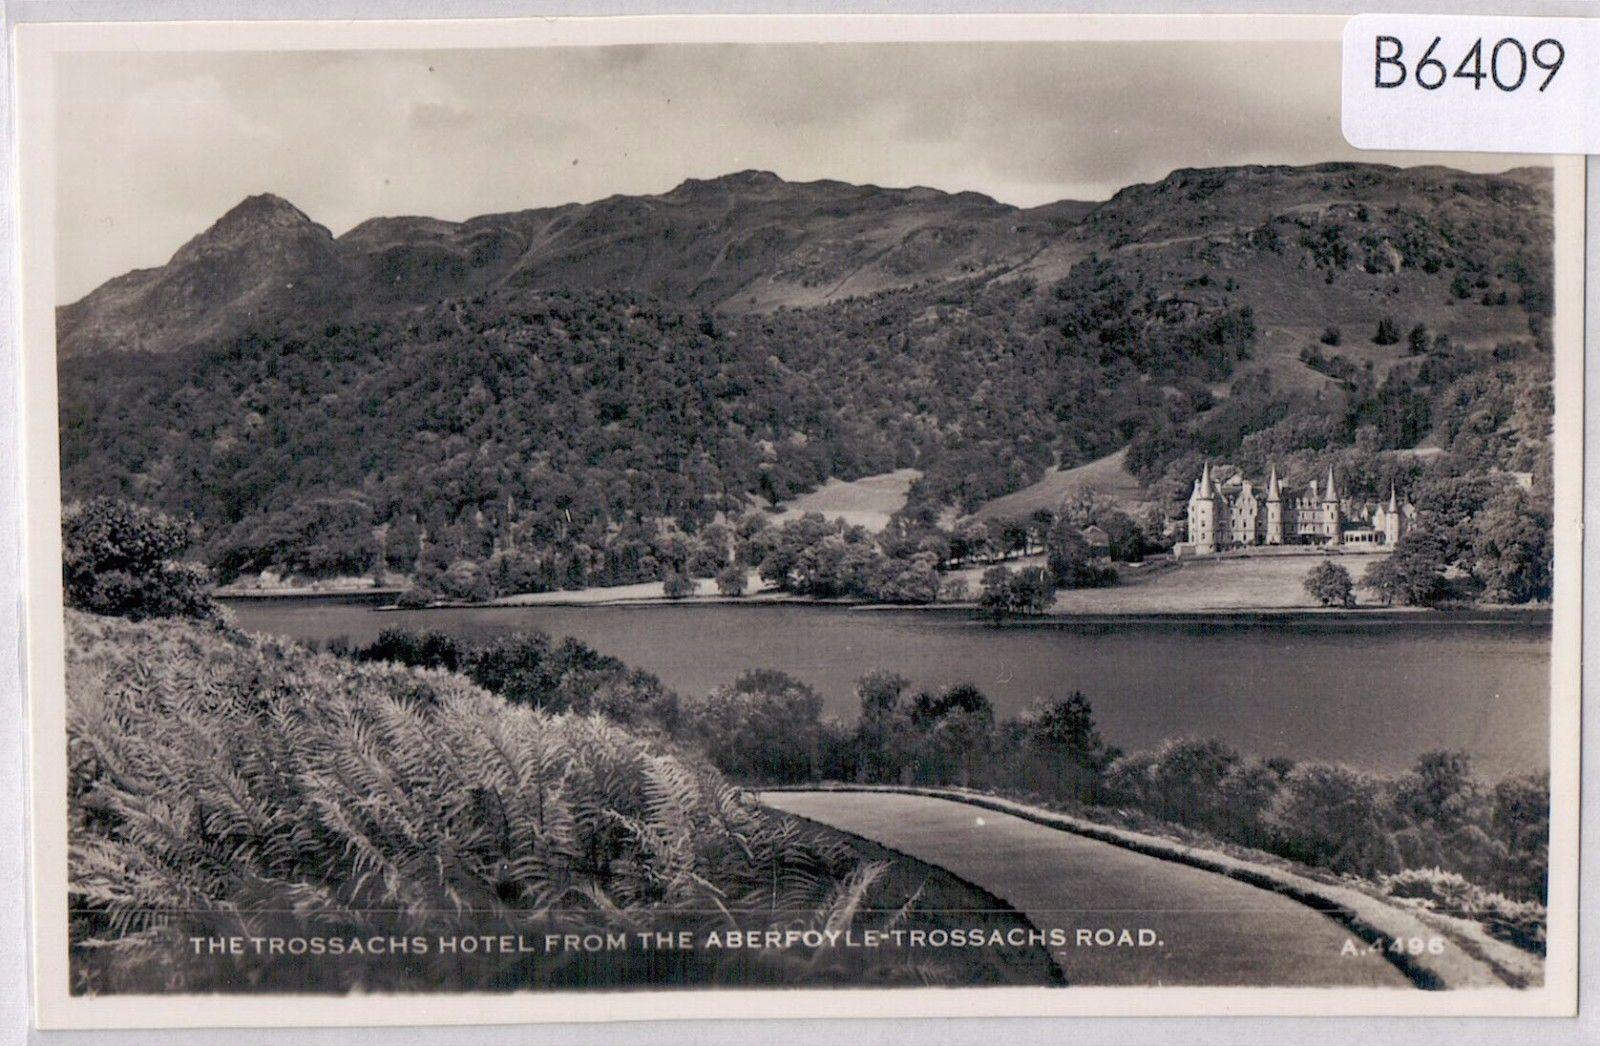 B6409cgt UK Trossachs Hotel from Aberfoyle Trossachs Road vintage postcard | eBay